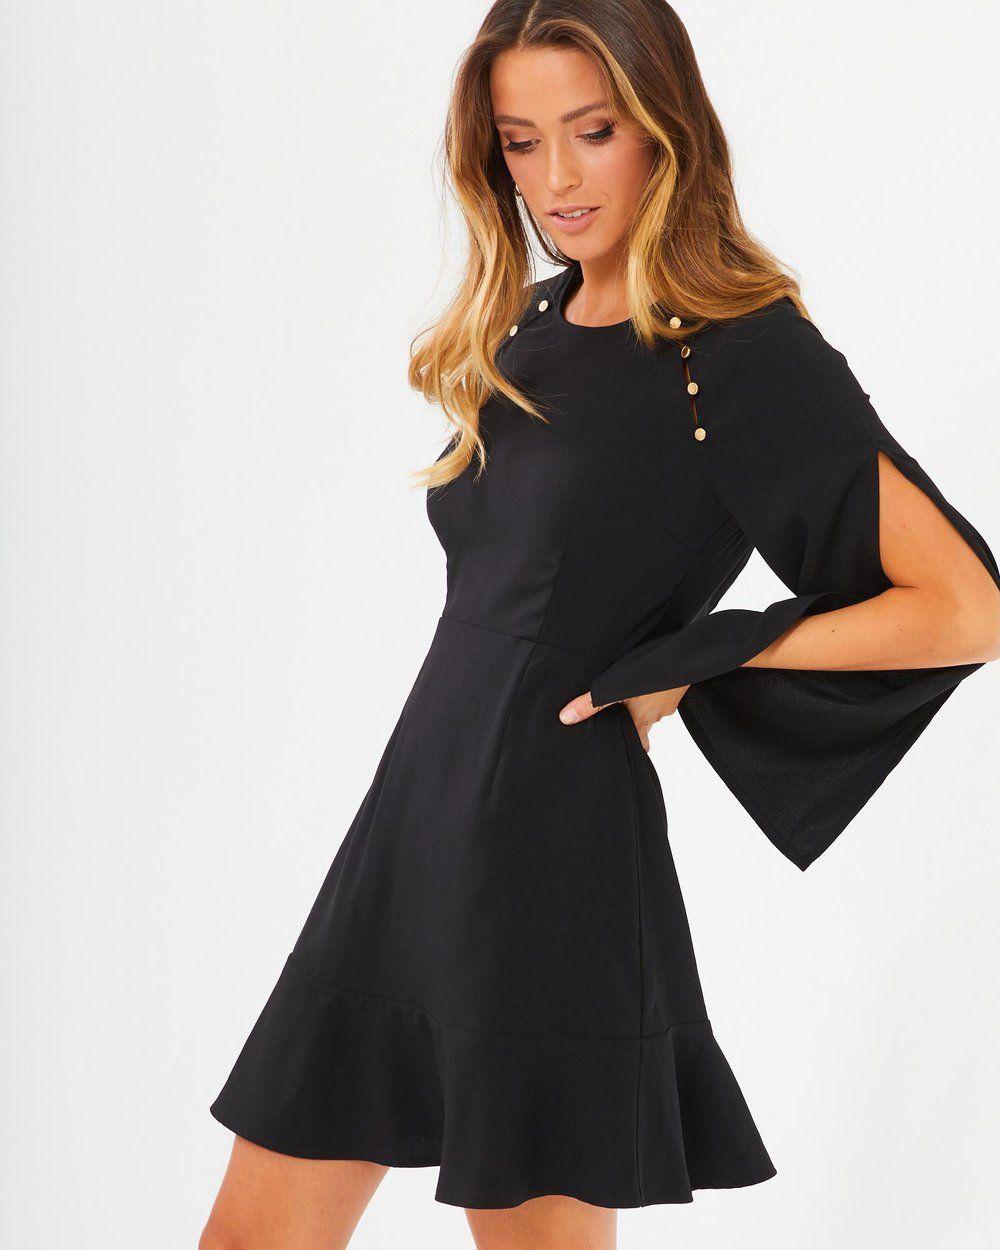 232ec538f Formal Dresses For Juniors Under 50